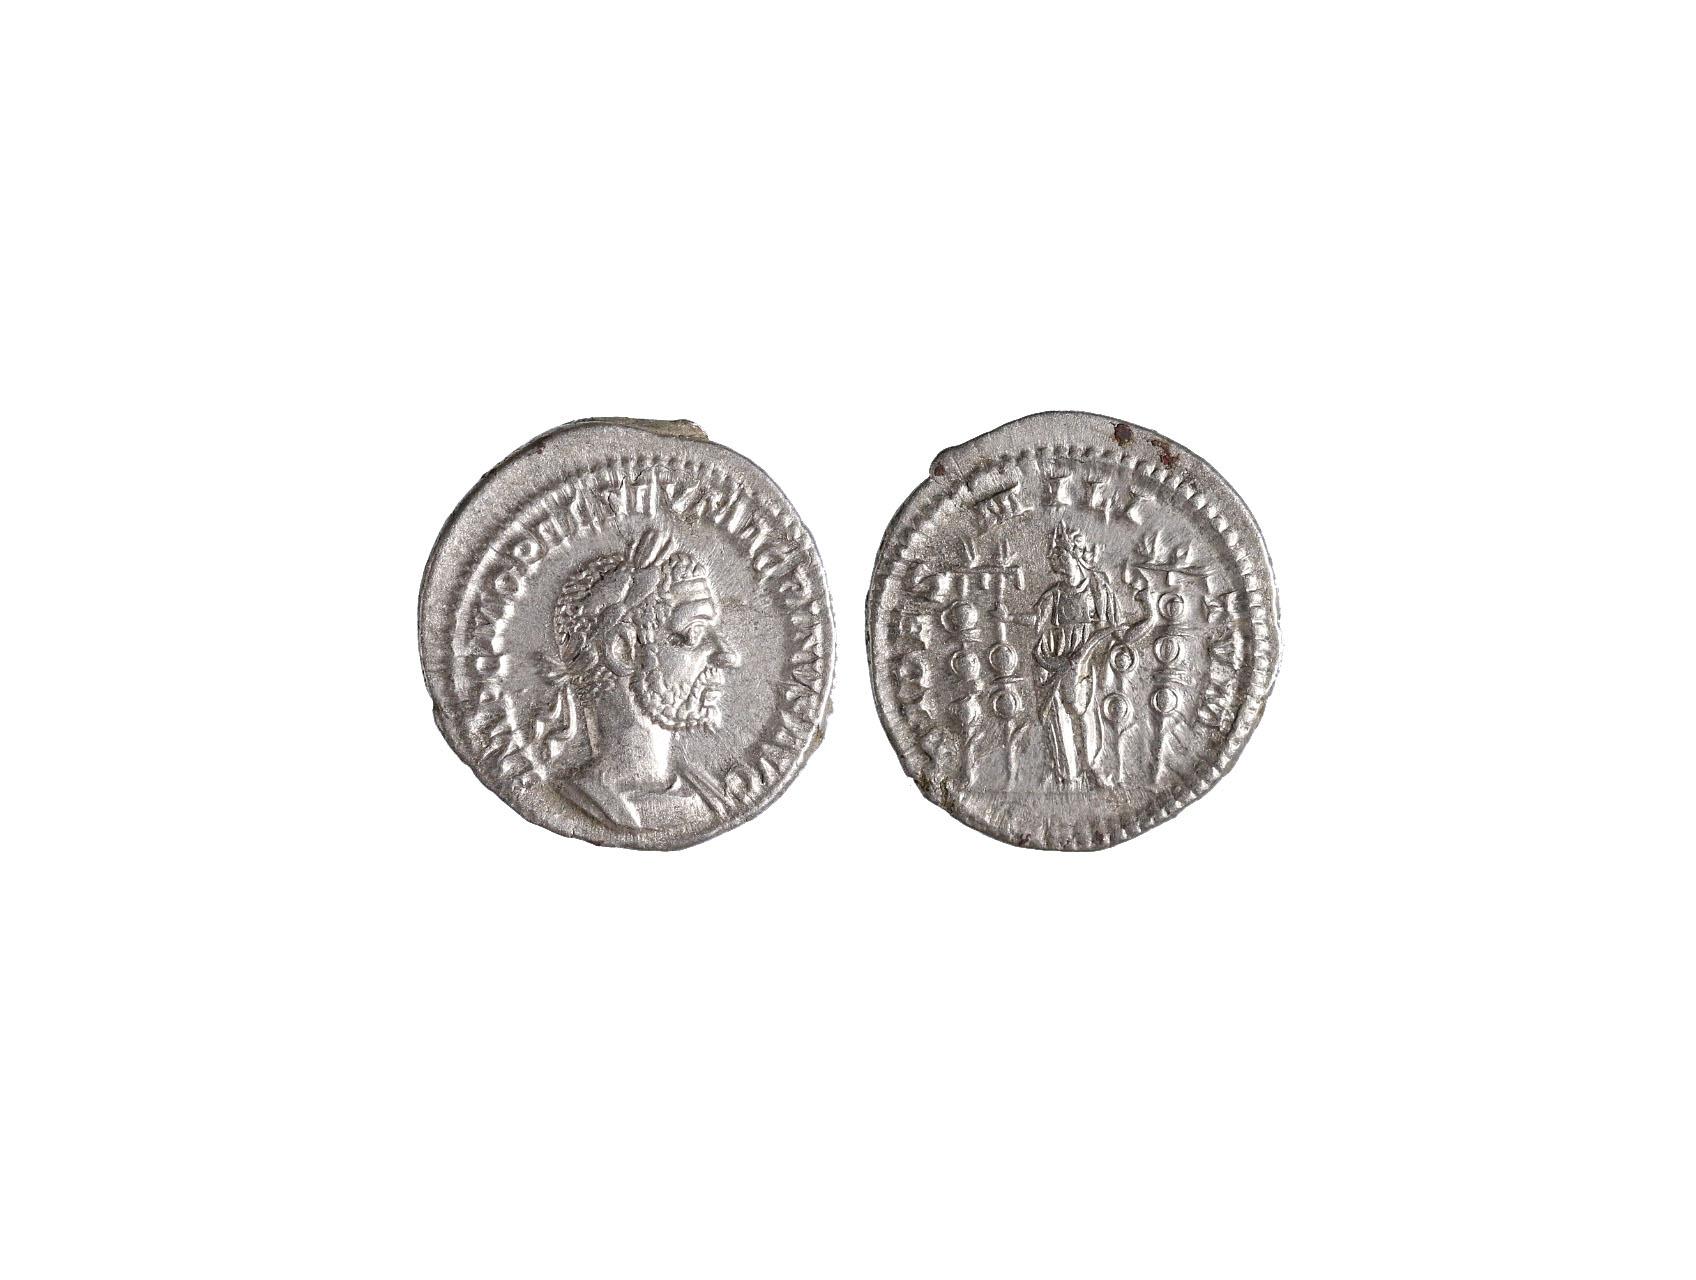 Řím císařství, Macrinus 217 - 218 n.l. - Denár, patina